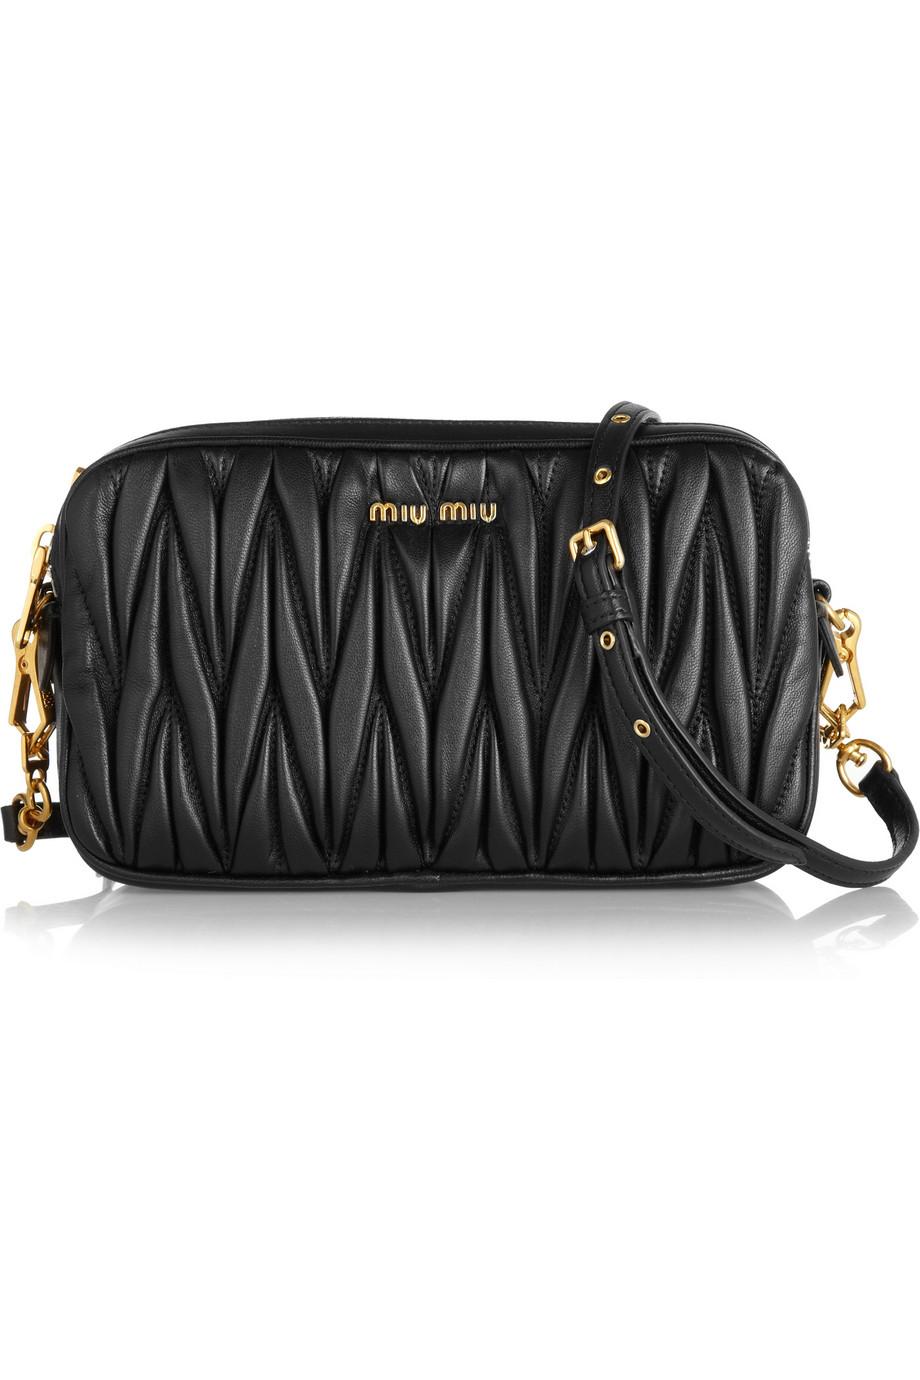 Lyst - Miu Miu Matelassé Leather Shoulder Bag in Black b0a011b3fd